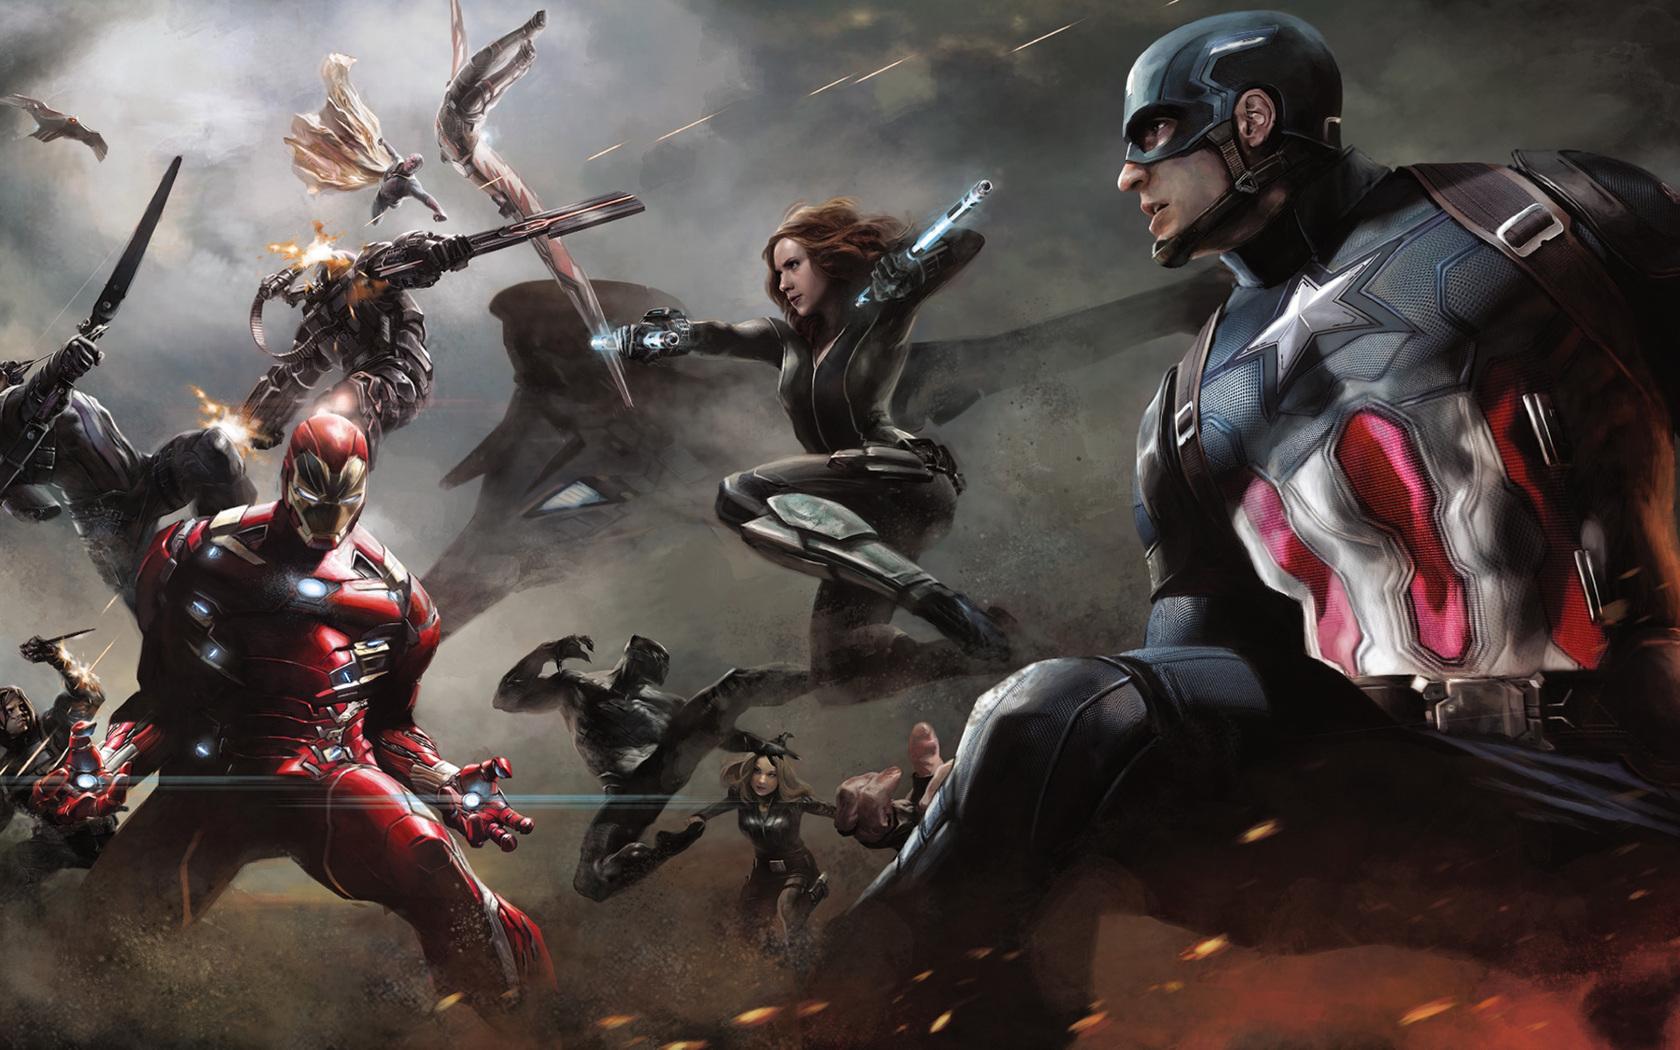 1680x1050 Captain America Civil War Best 1680x1050 Resolution Hd 4k